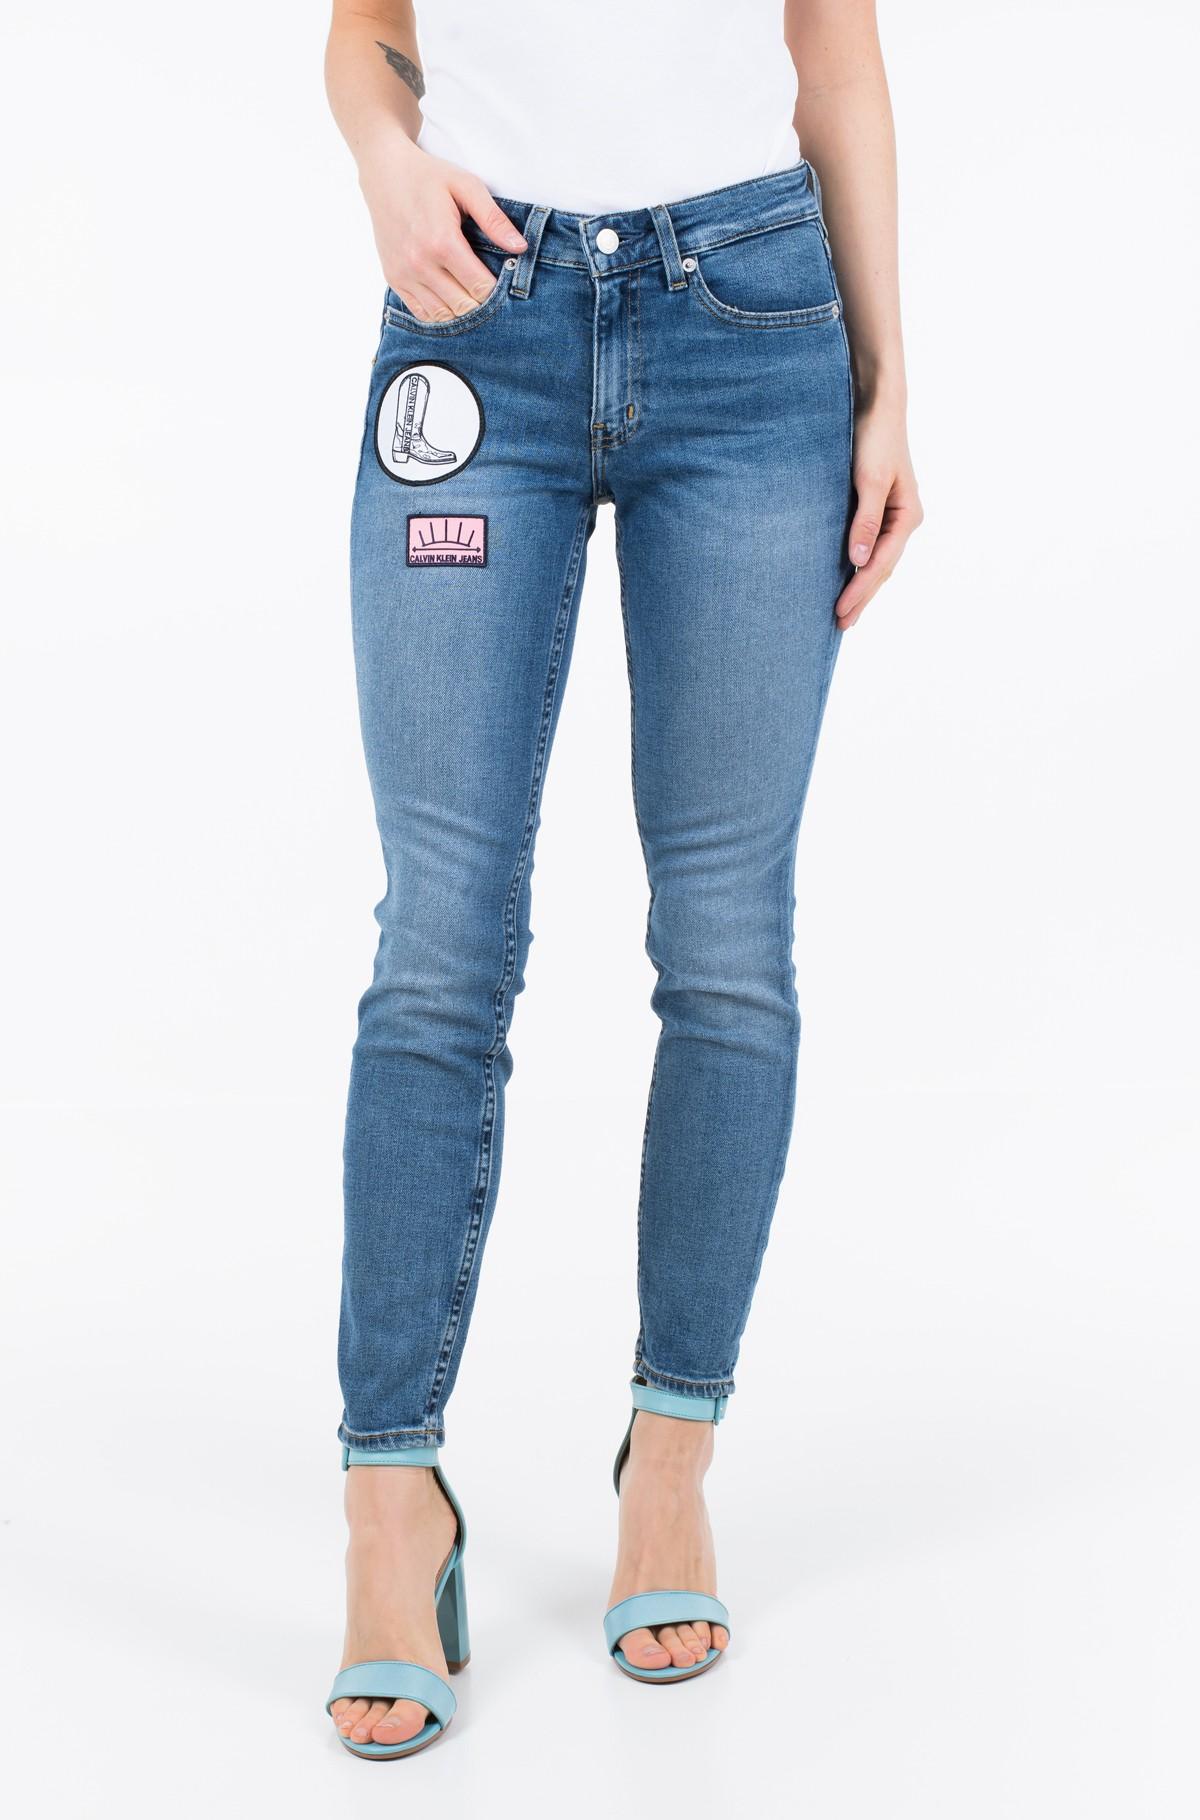 Jeans CKJ 011 MID RISE SKINNY ANKLE J20J210988-full-1